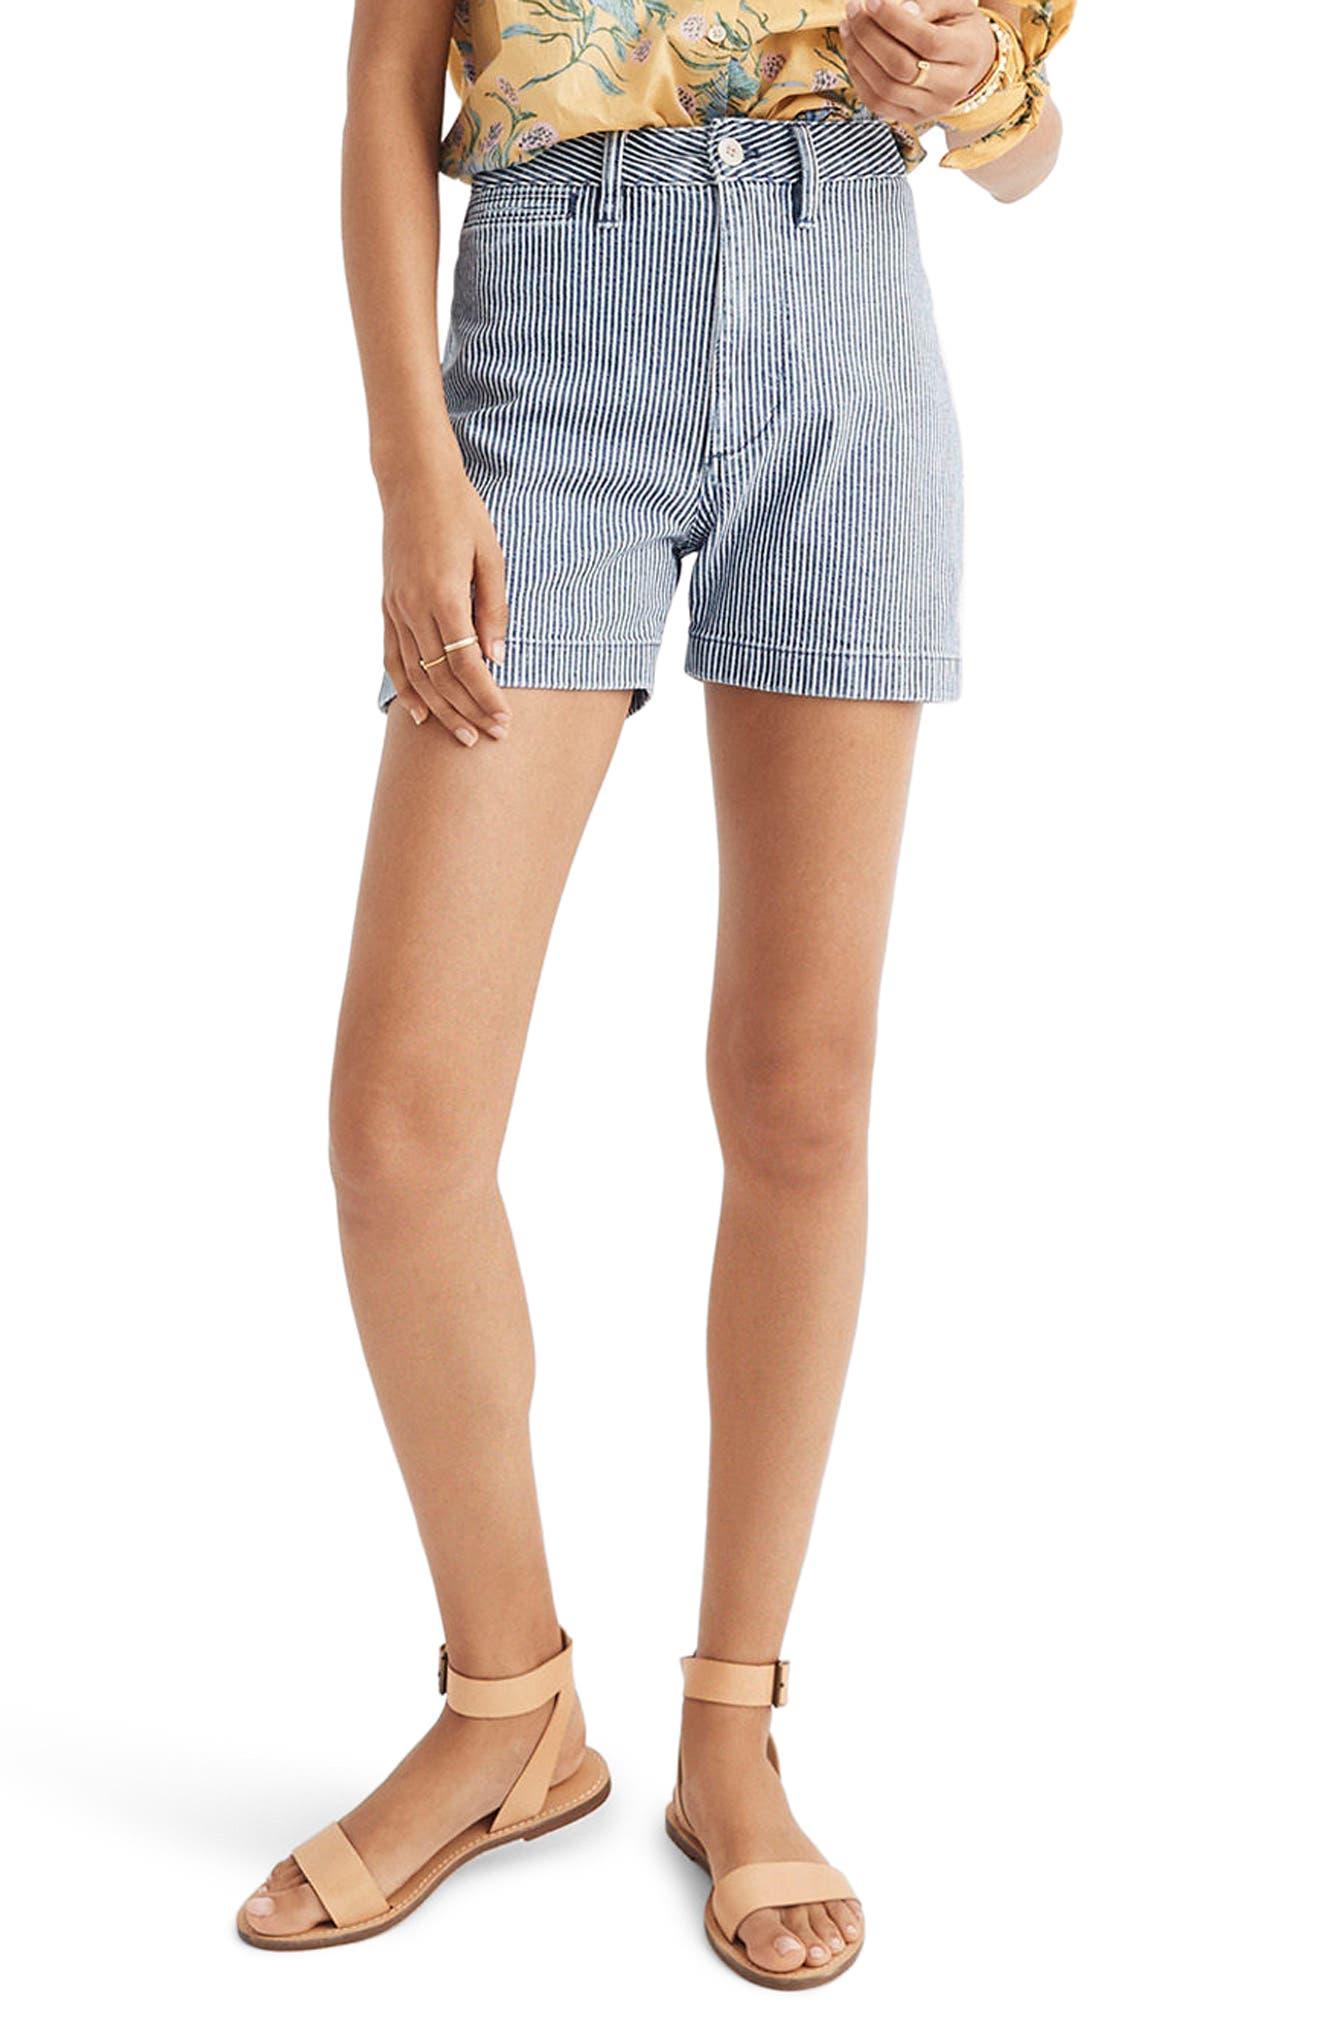 Emmett Stripe Denim Shorts,                             Main thumbnail 1, color,                             400